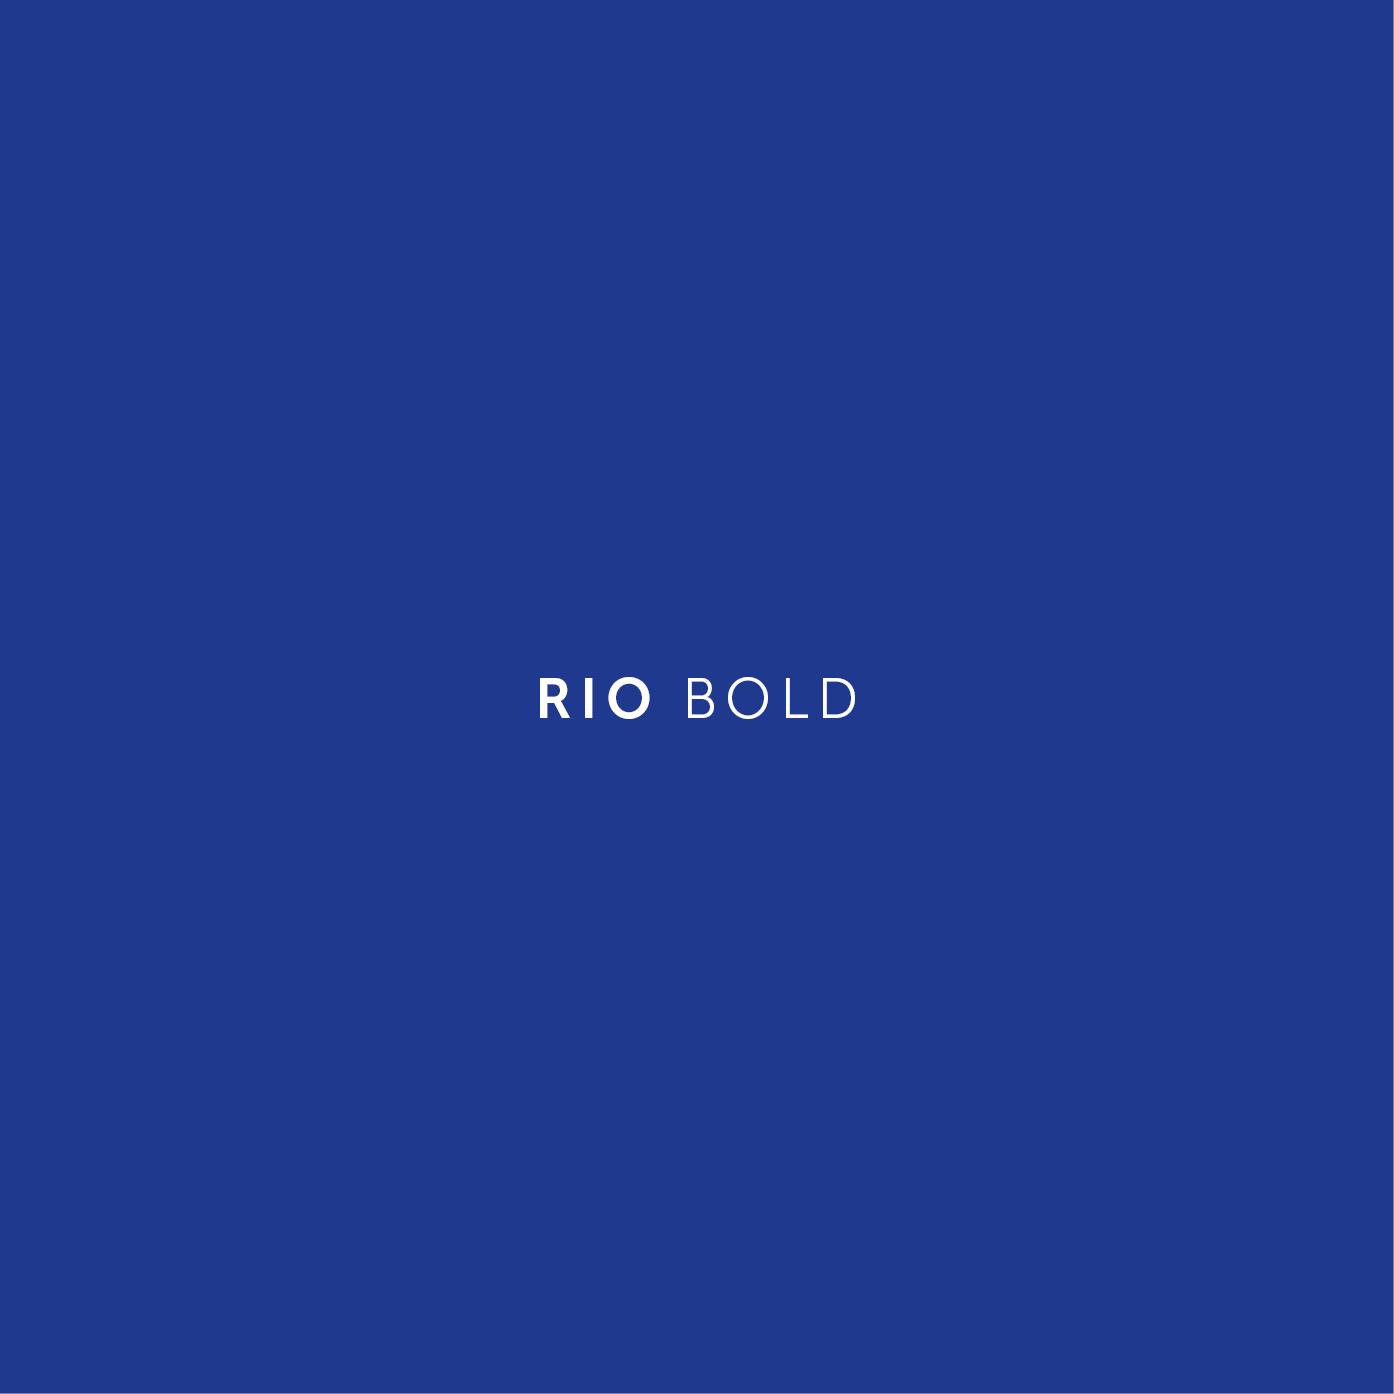 RioBold-Title.jpg